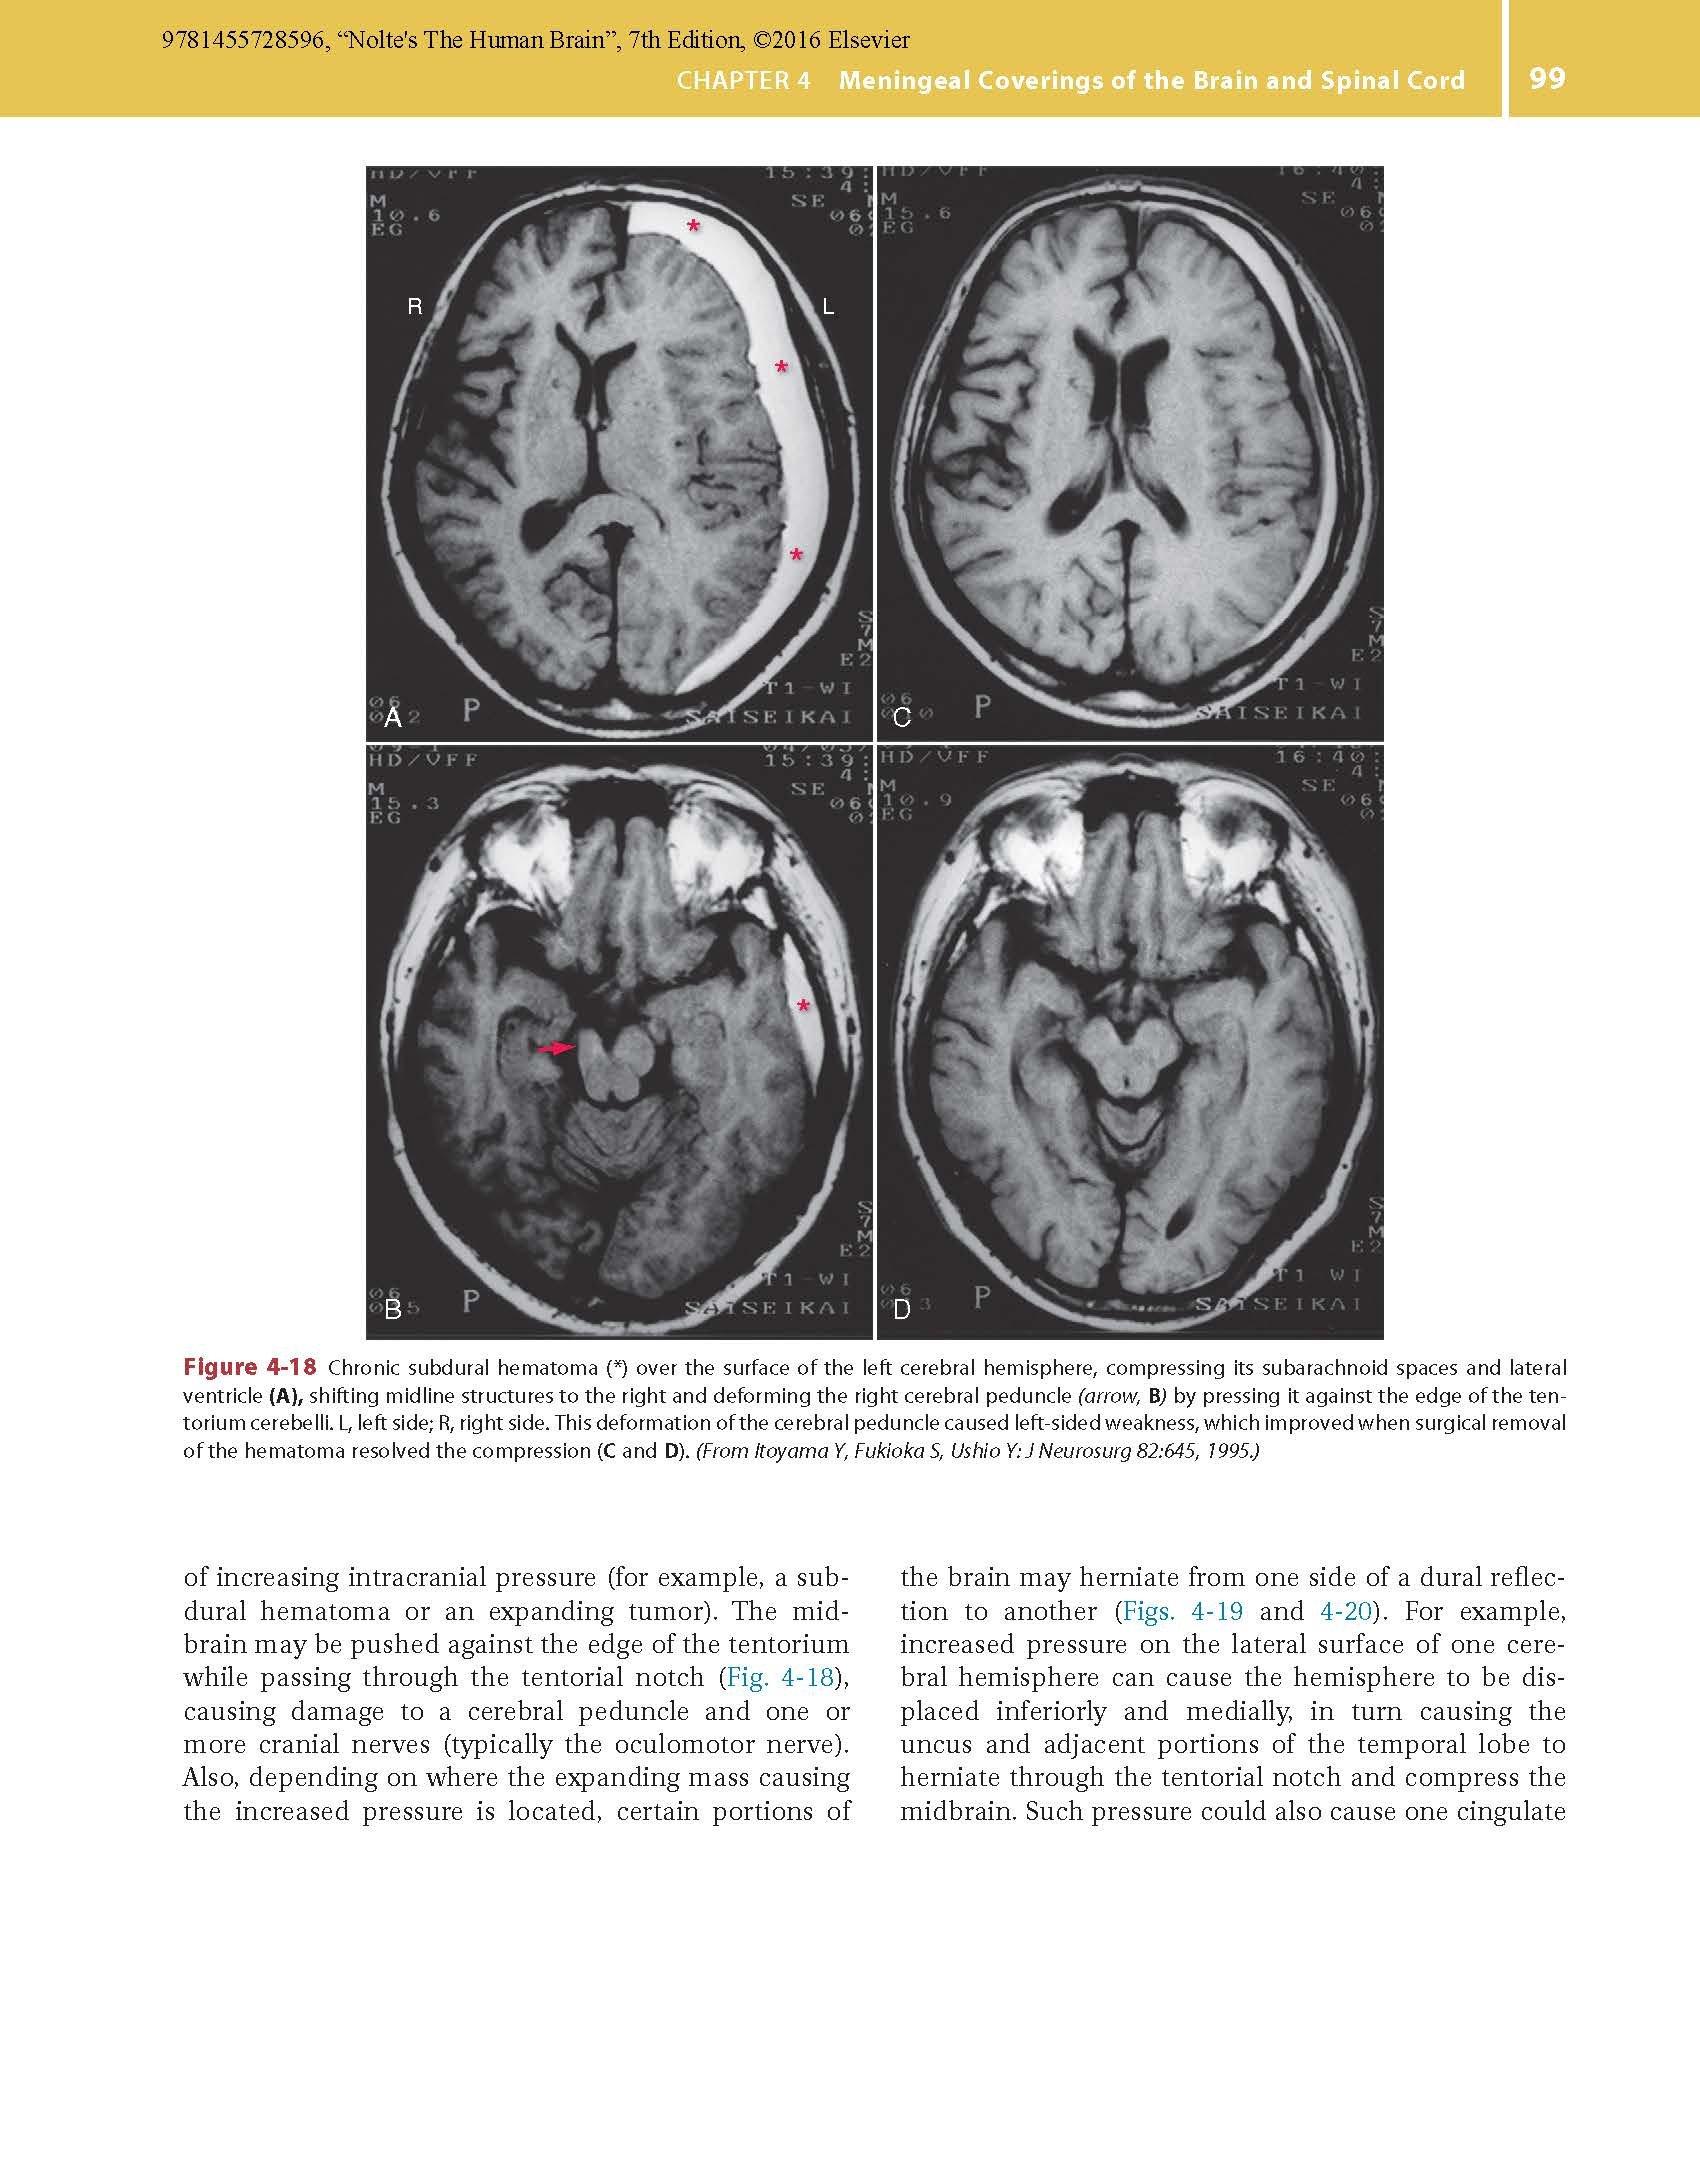 The human brain coloring book diamond - Nolte S The Human Brain An Introduction To Its Functional Anatomy Todd Vanderah Phd Douglas J Gould Phd 9781455728596 Anatomy Amazon Canada